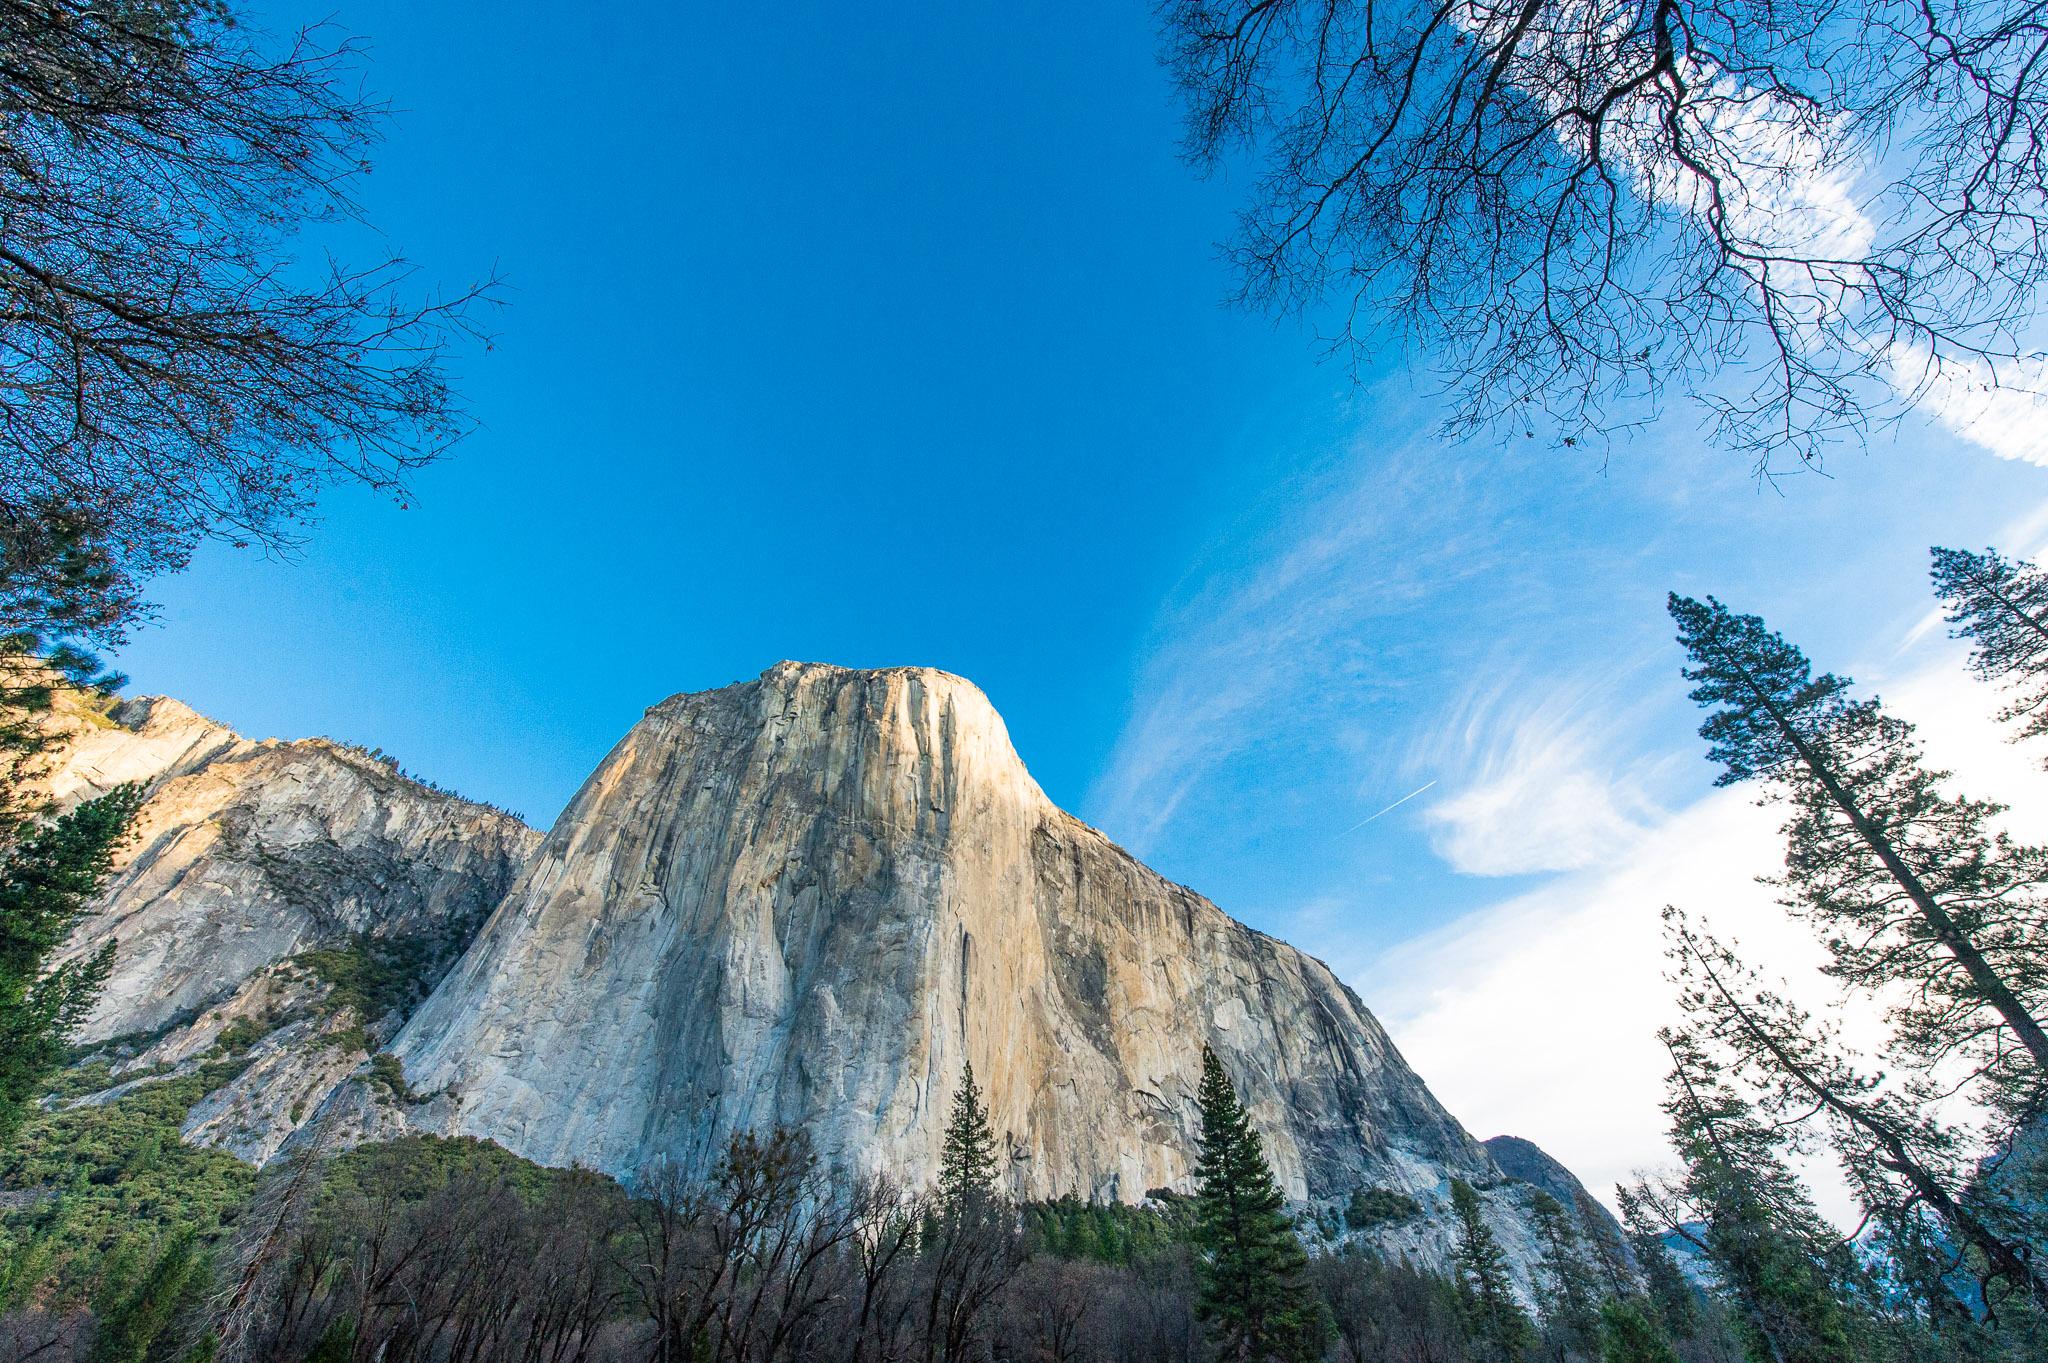 Jason-Davis-Images-Yosemite-0014.jpg